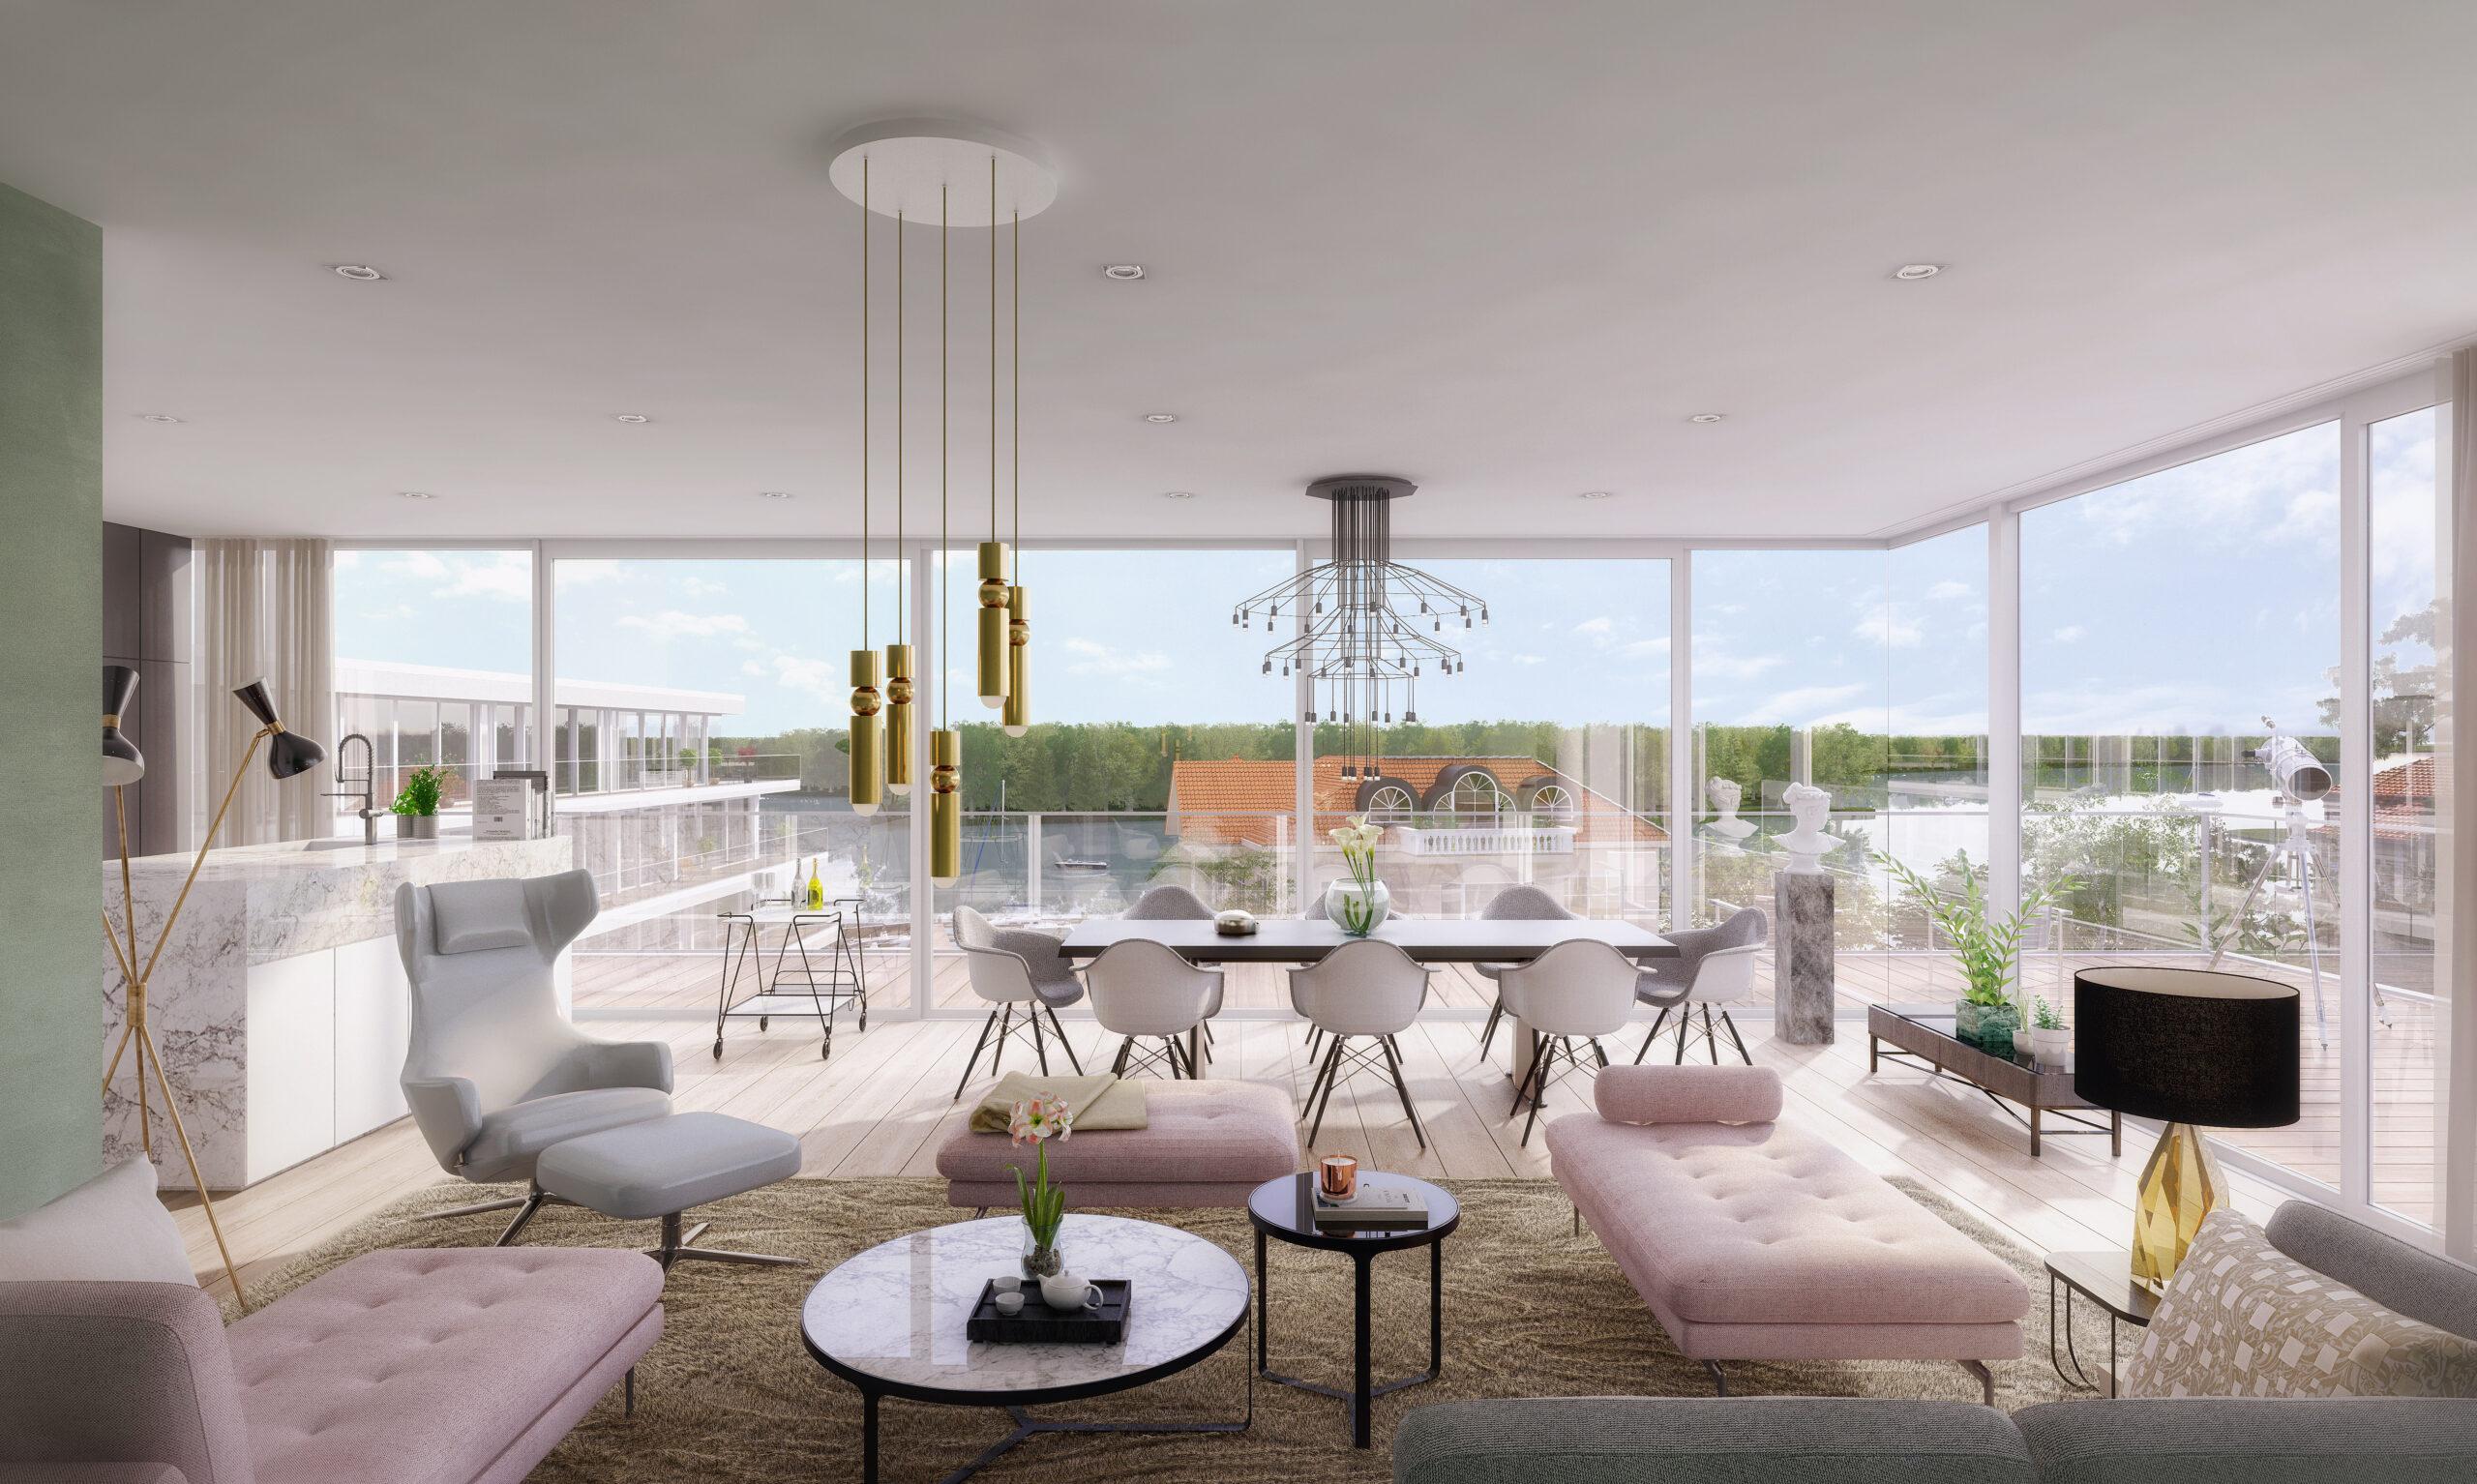 mojoimages architekturvisualisierung wohnpark jungfernsee penthouse